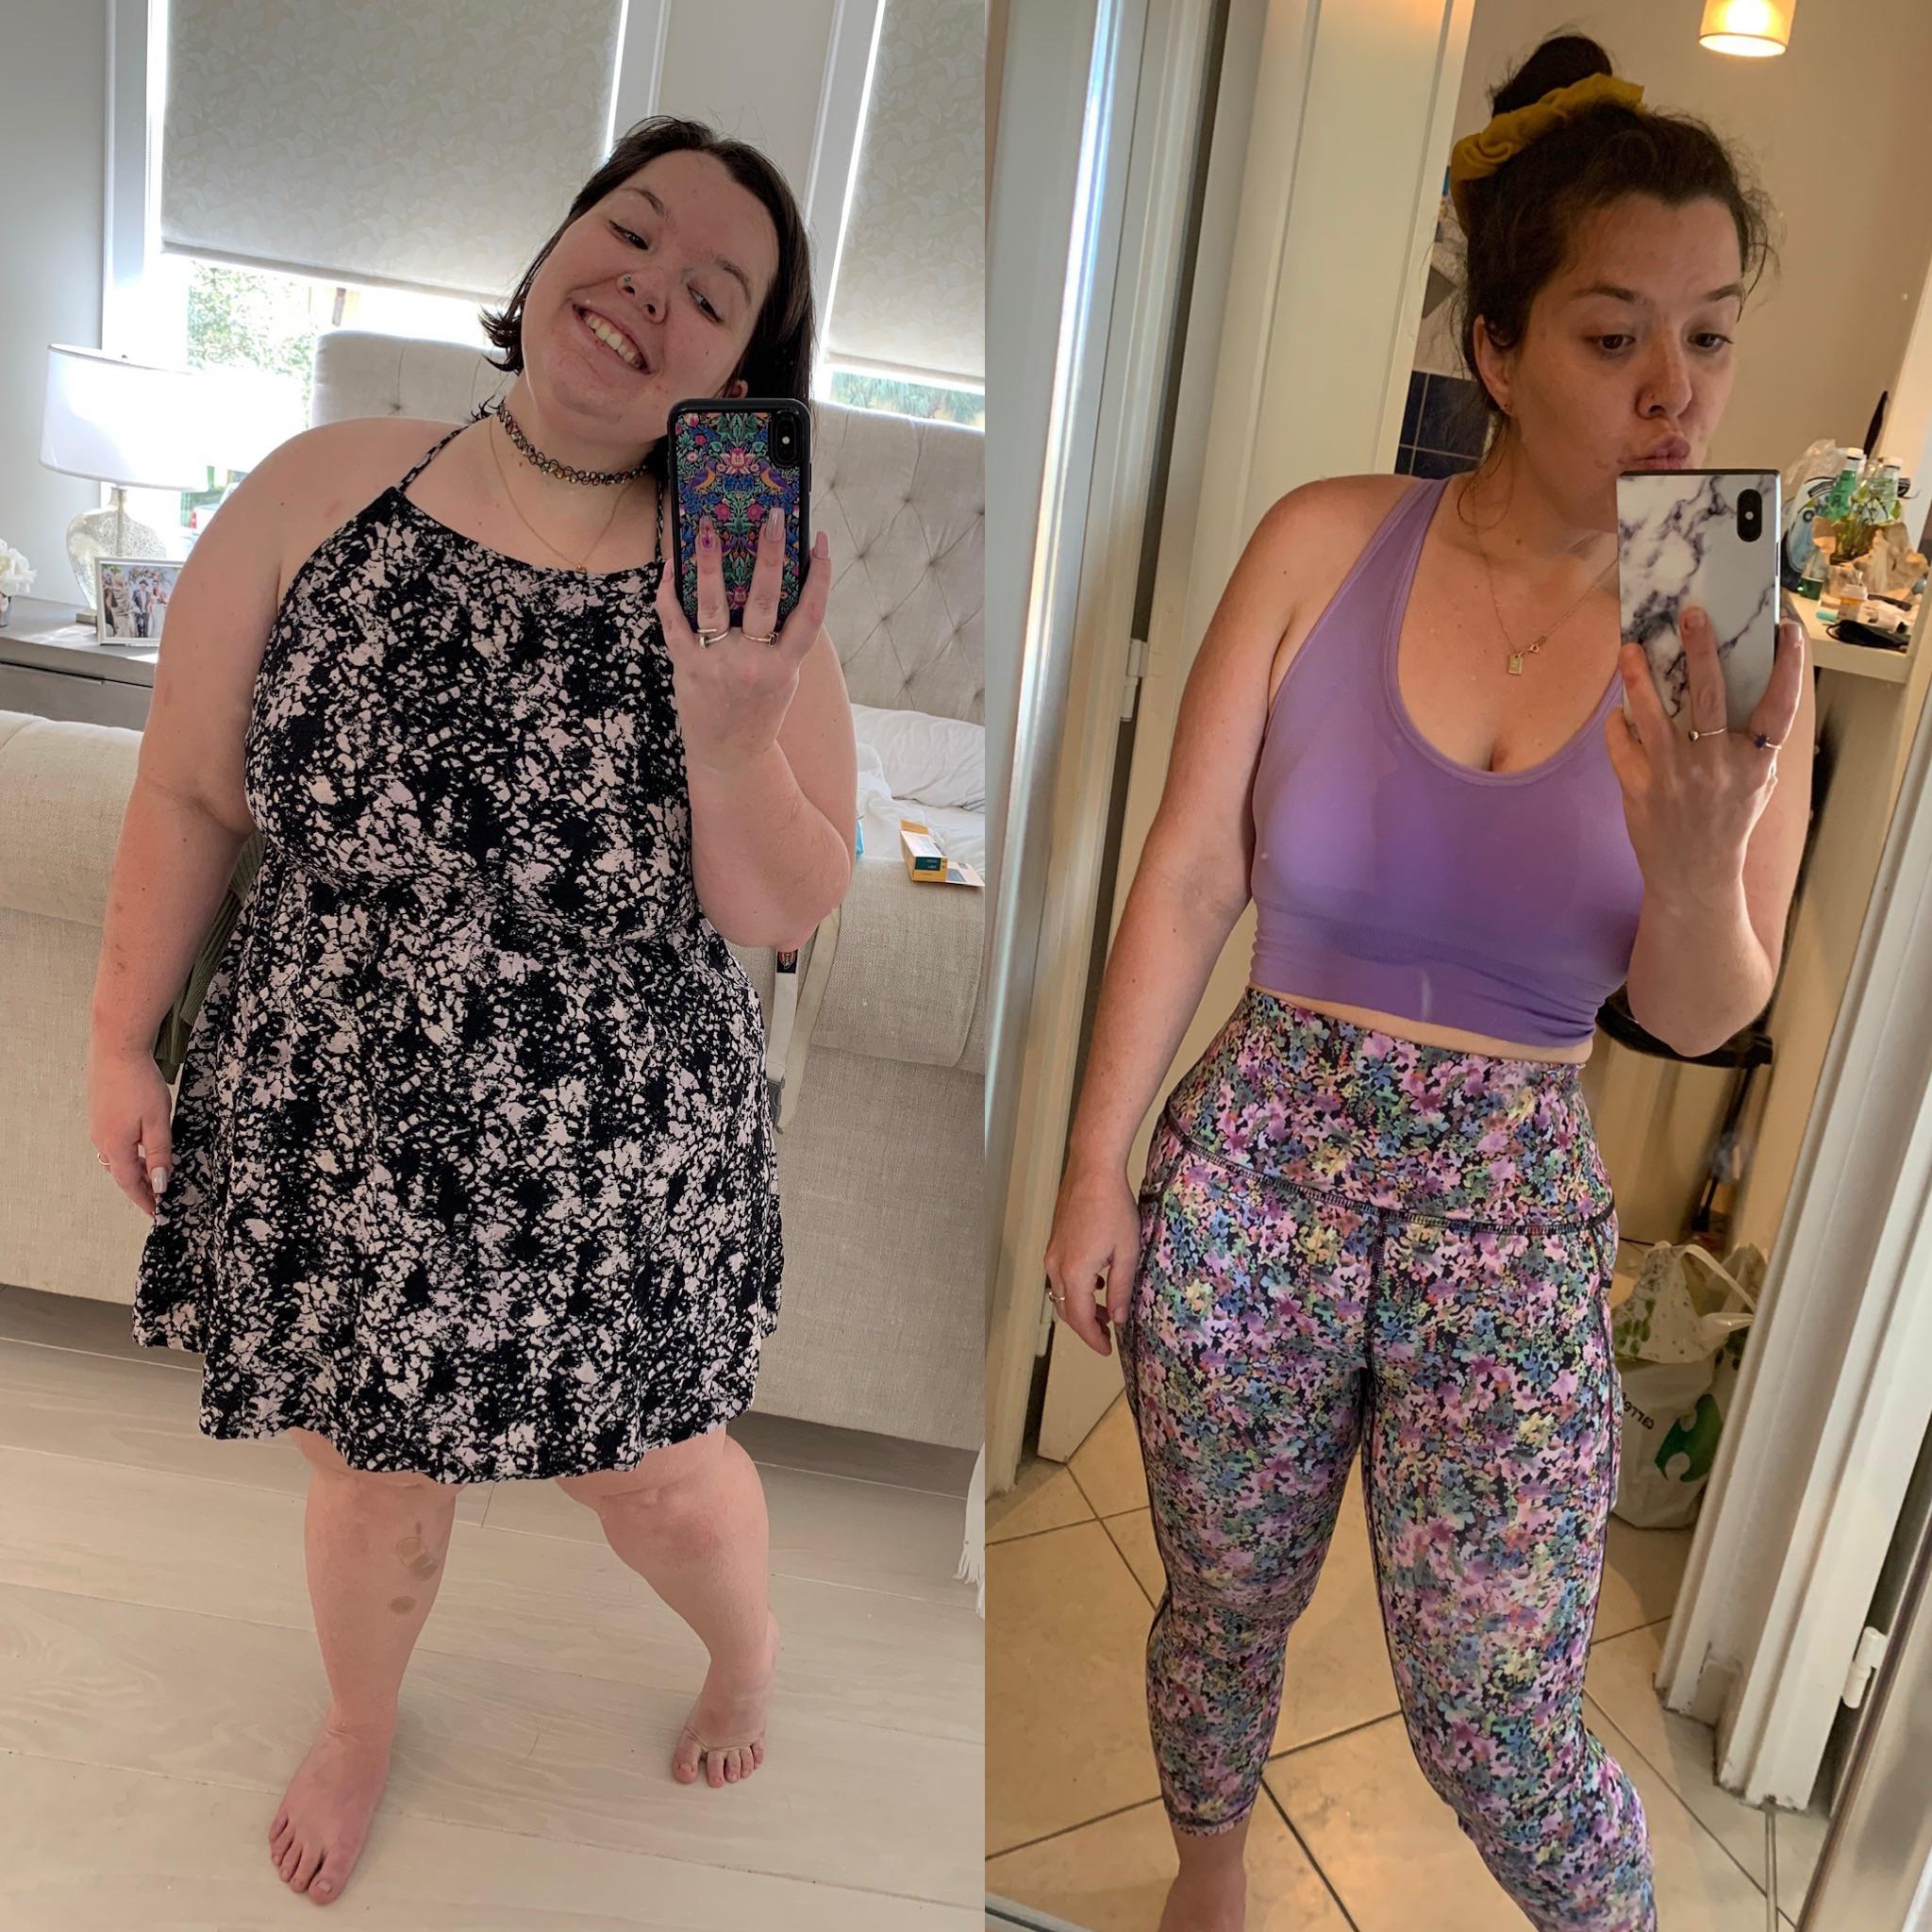 Progress Pics of 96 lbs Weight Loss 5 foot Female 226 lbs to 130 lbs